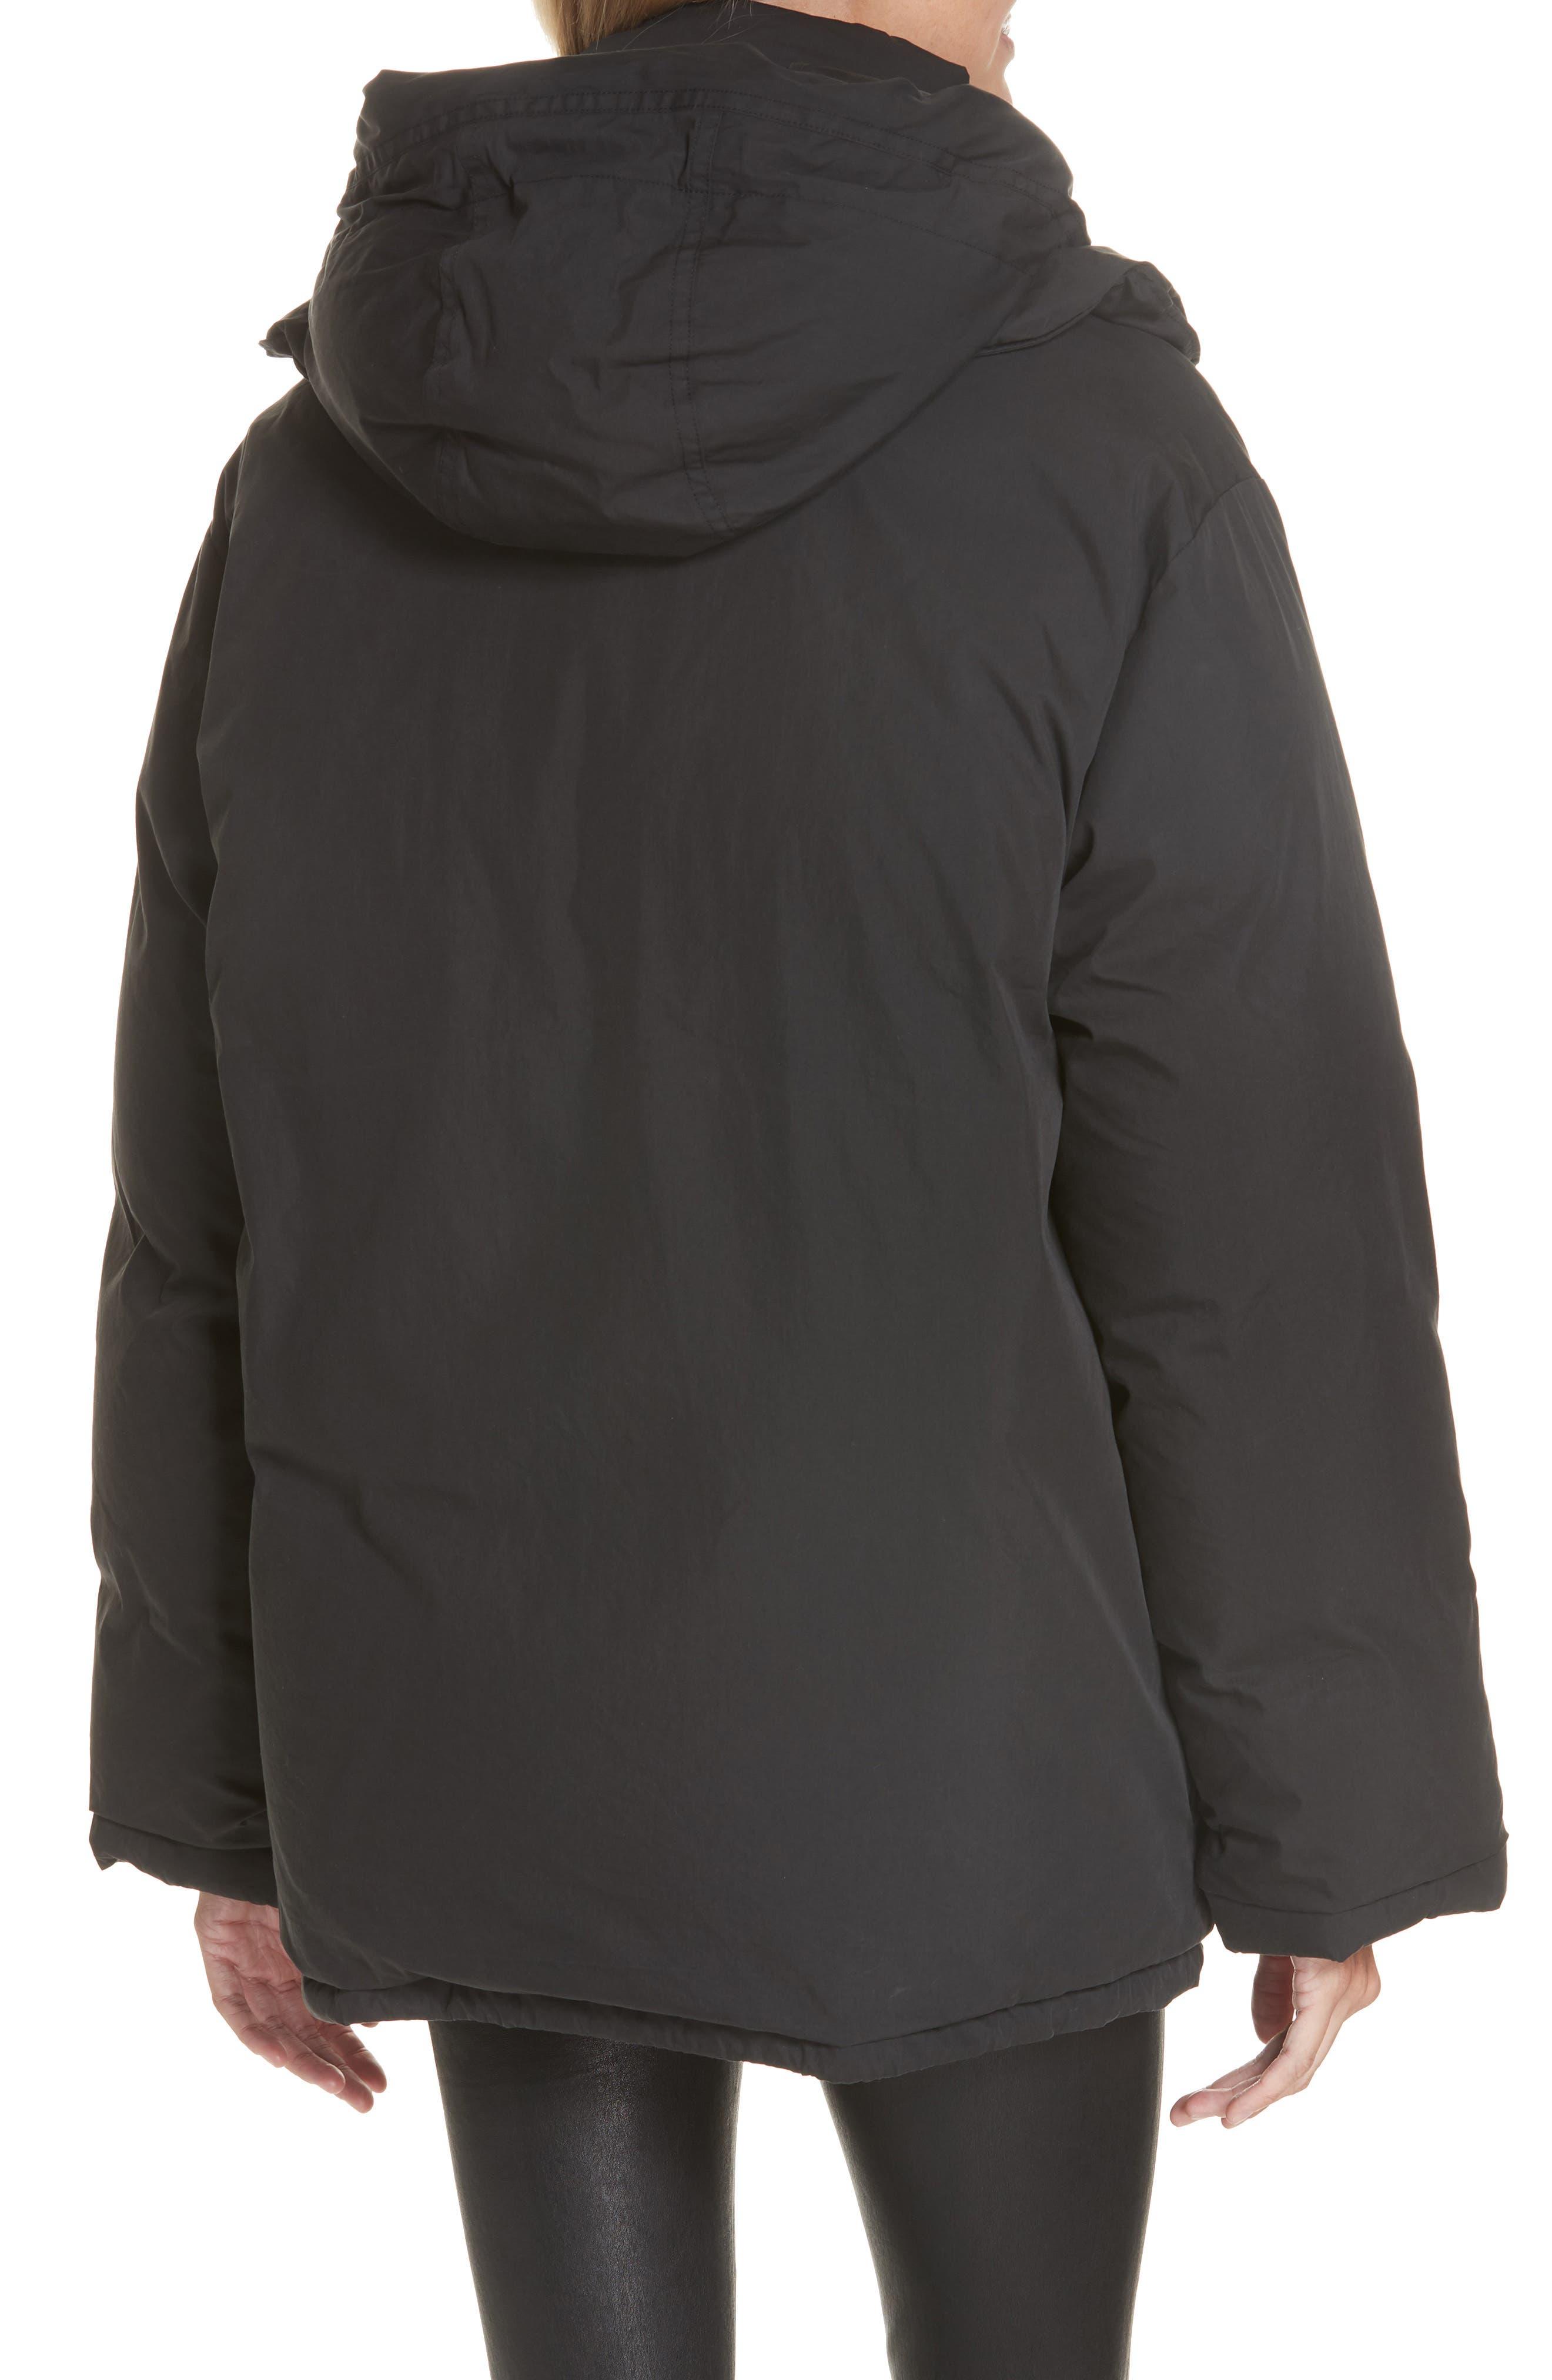 HELMUT LANG, Removable Hood Puffer Jacket, Alternate thumbnail 4, color, 001